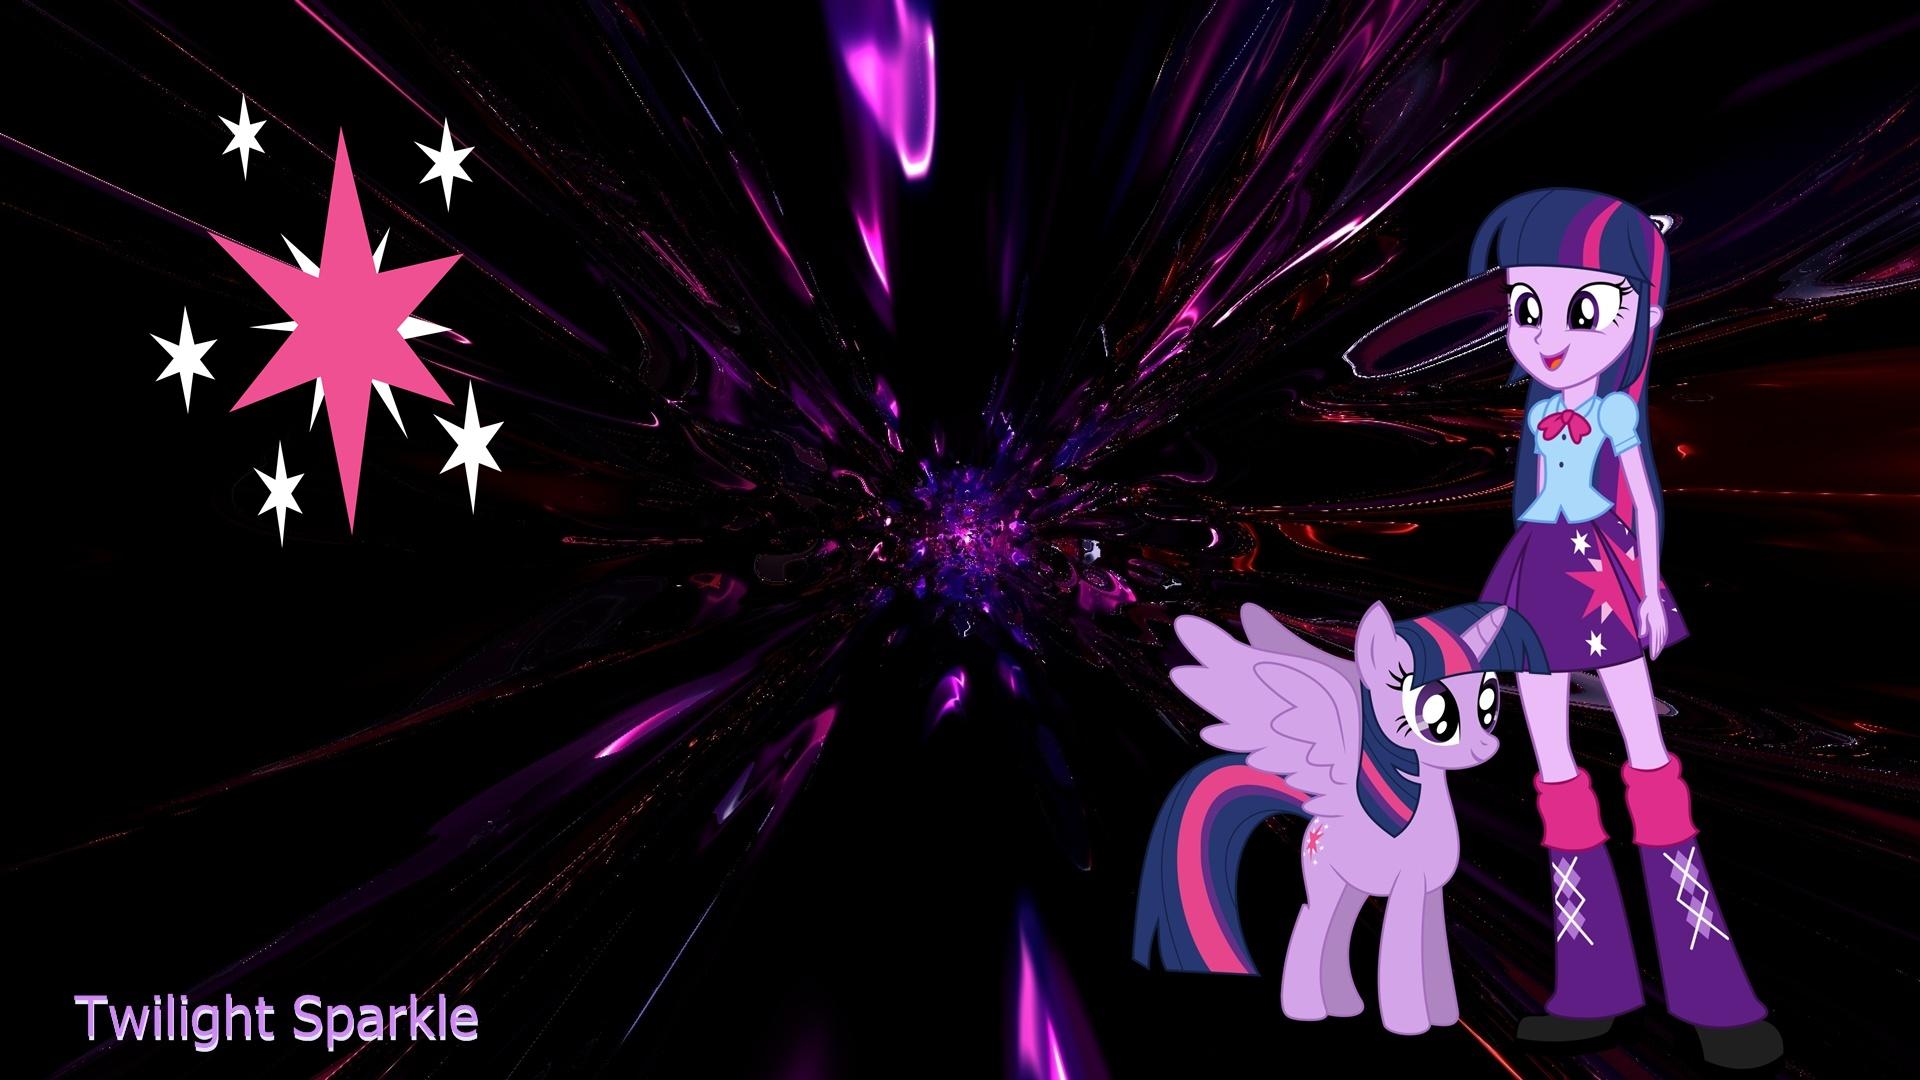 FANMADE Twilight Sparkle Wallpaper